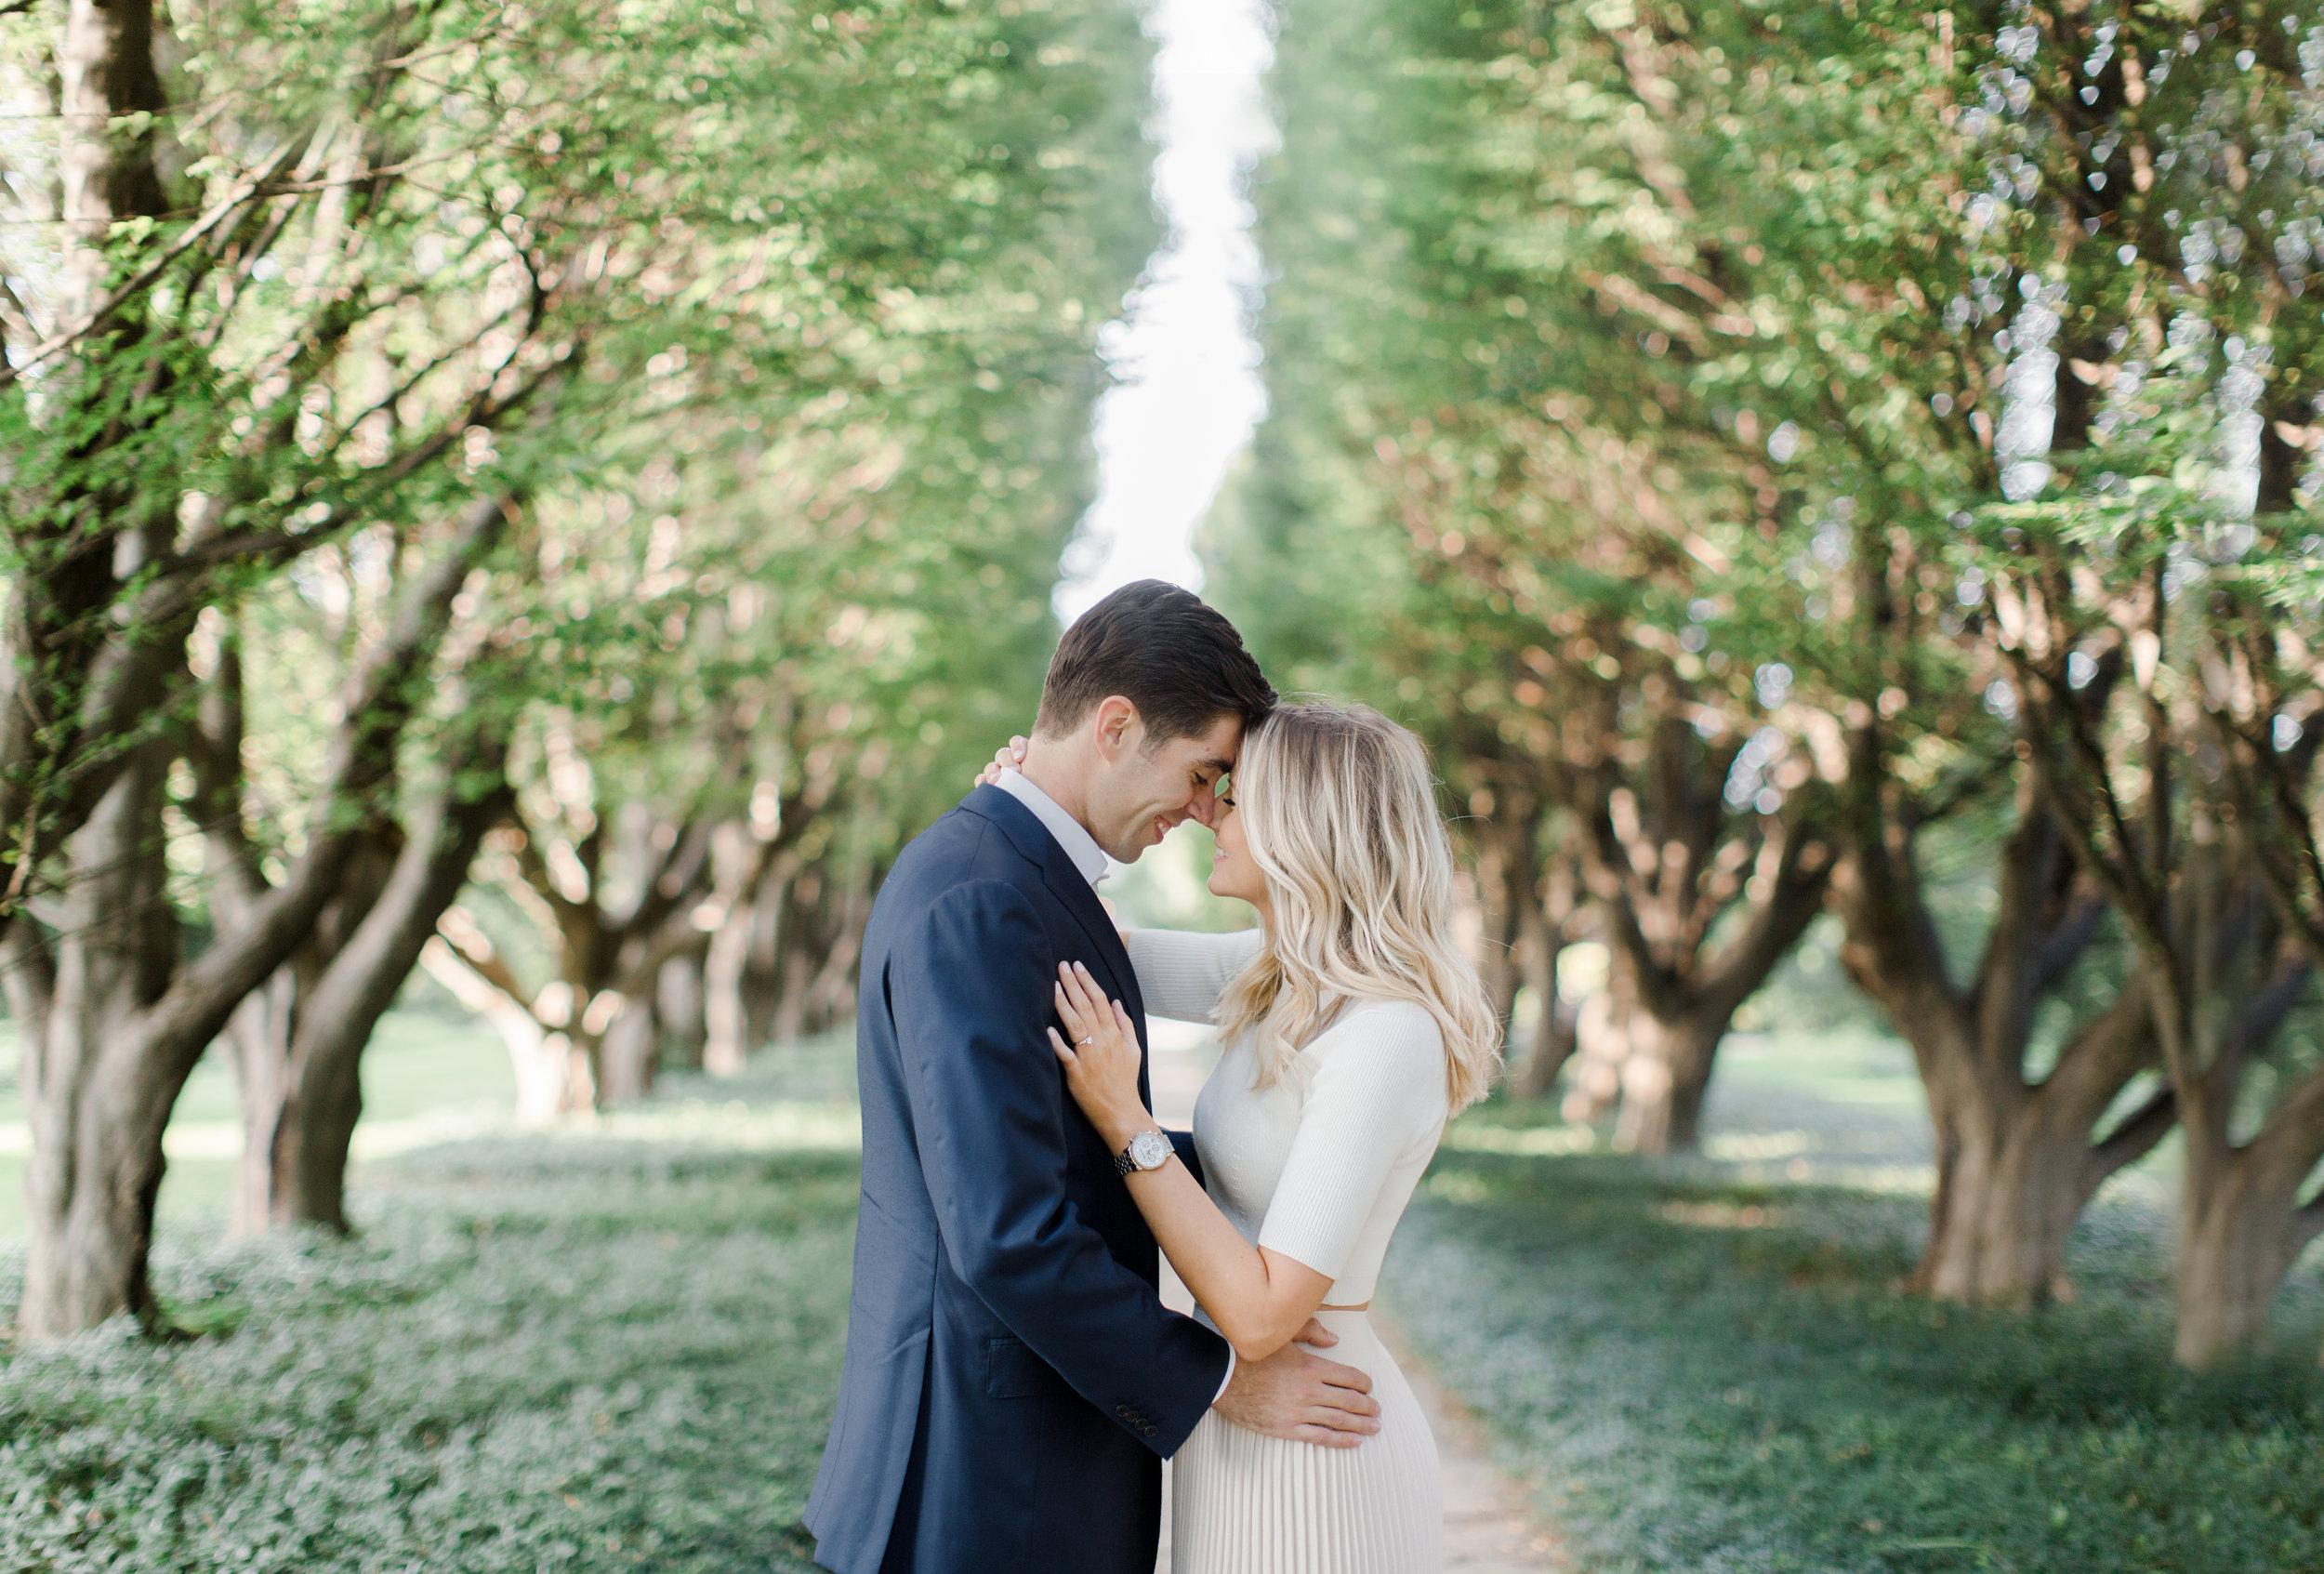 kurtz-orchard-gracewood-winery-wedding-photographer-richelle-hunter-sarah-jonathan-39.jpg